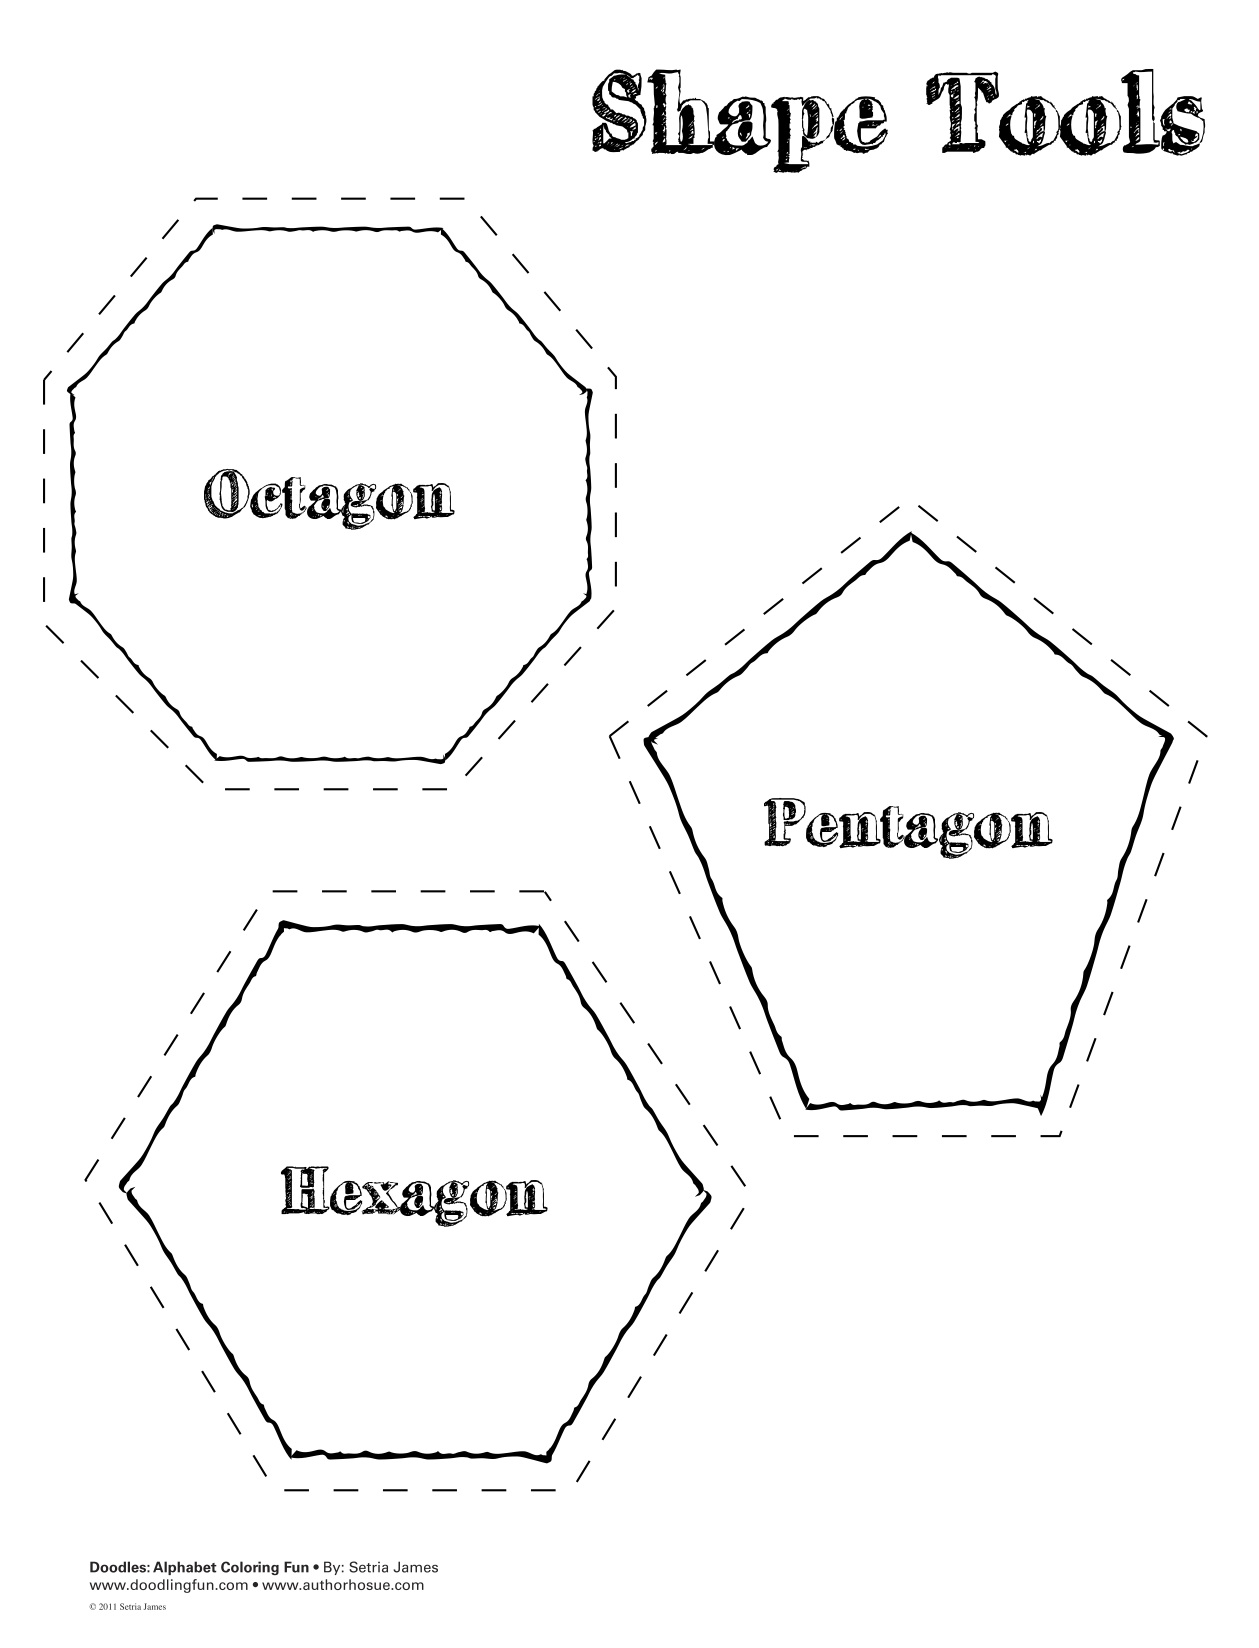 10 Best Images Of Basic Geometry Shapes Worksheets